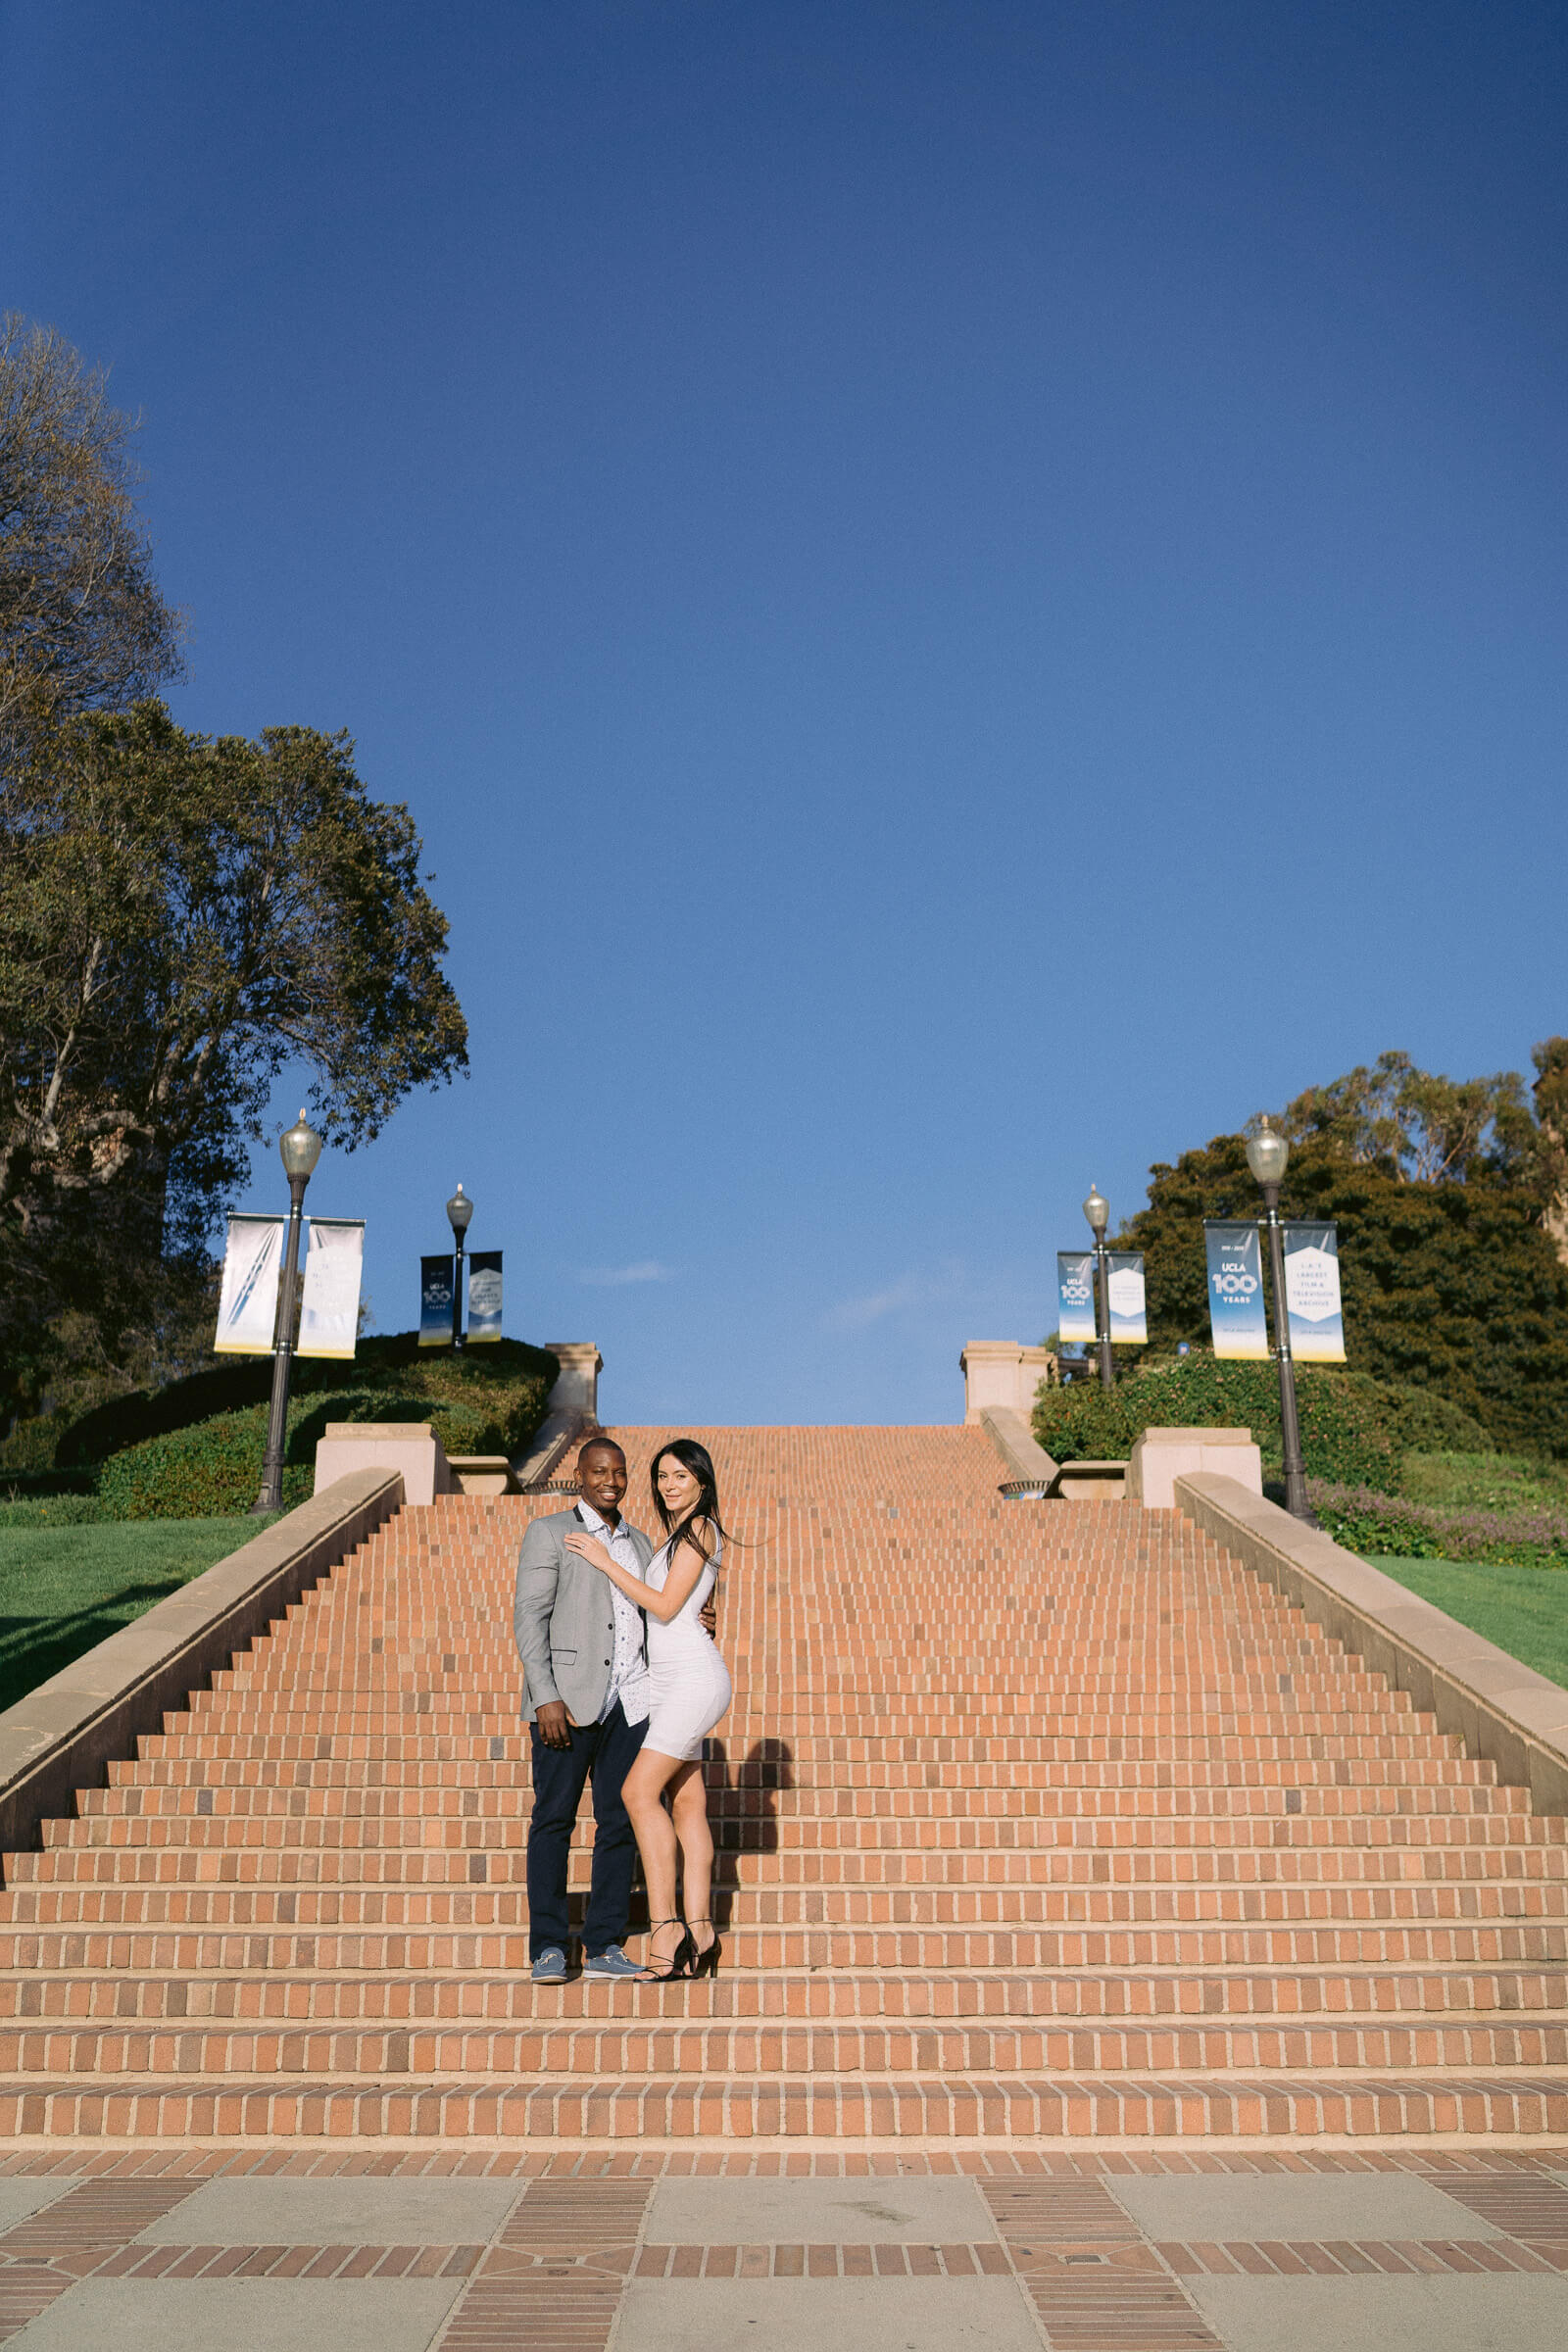 ucla-los-angeles-proposal-photographer-34.jpg